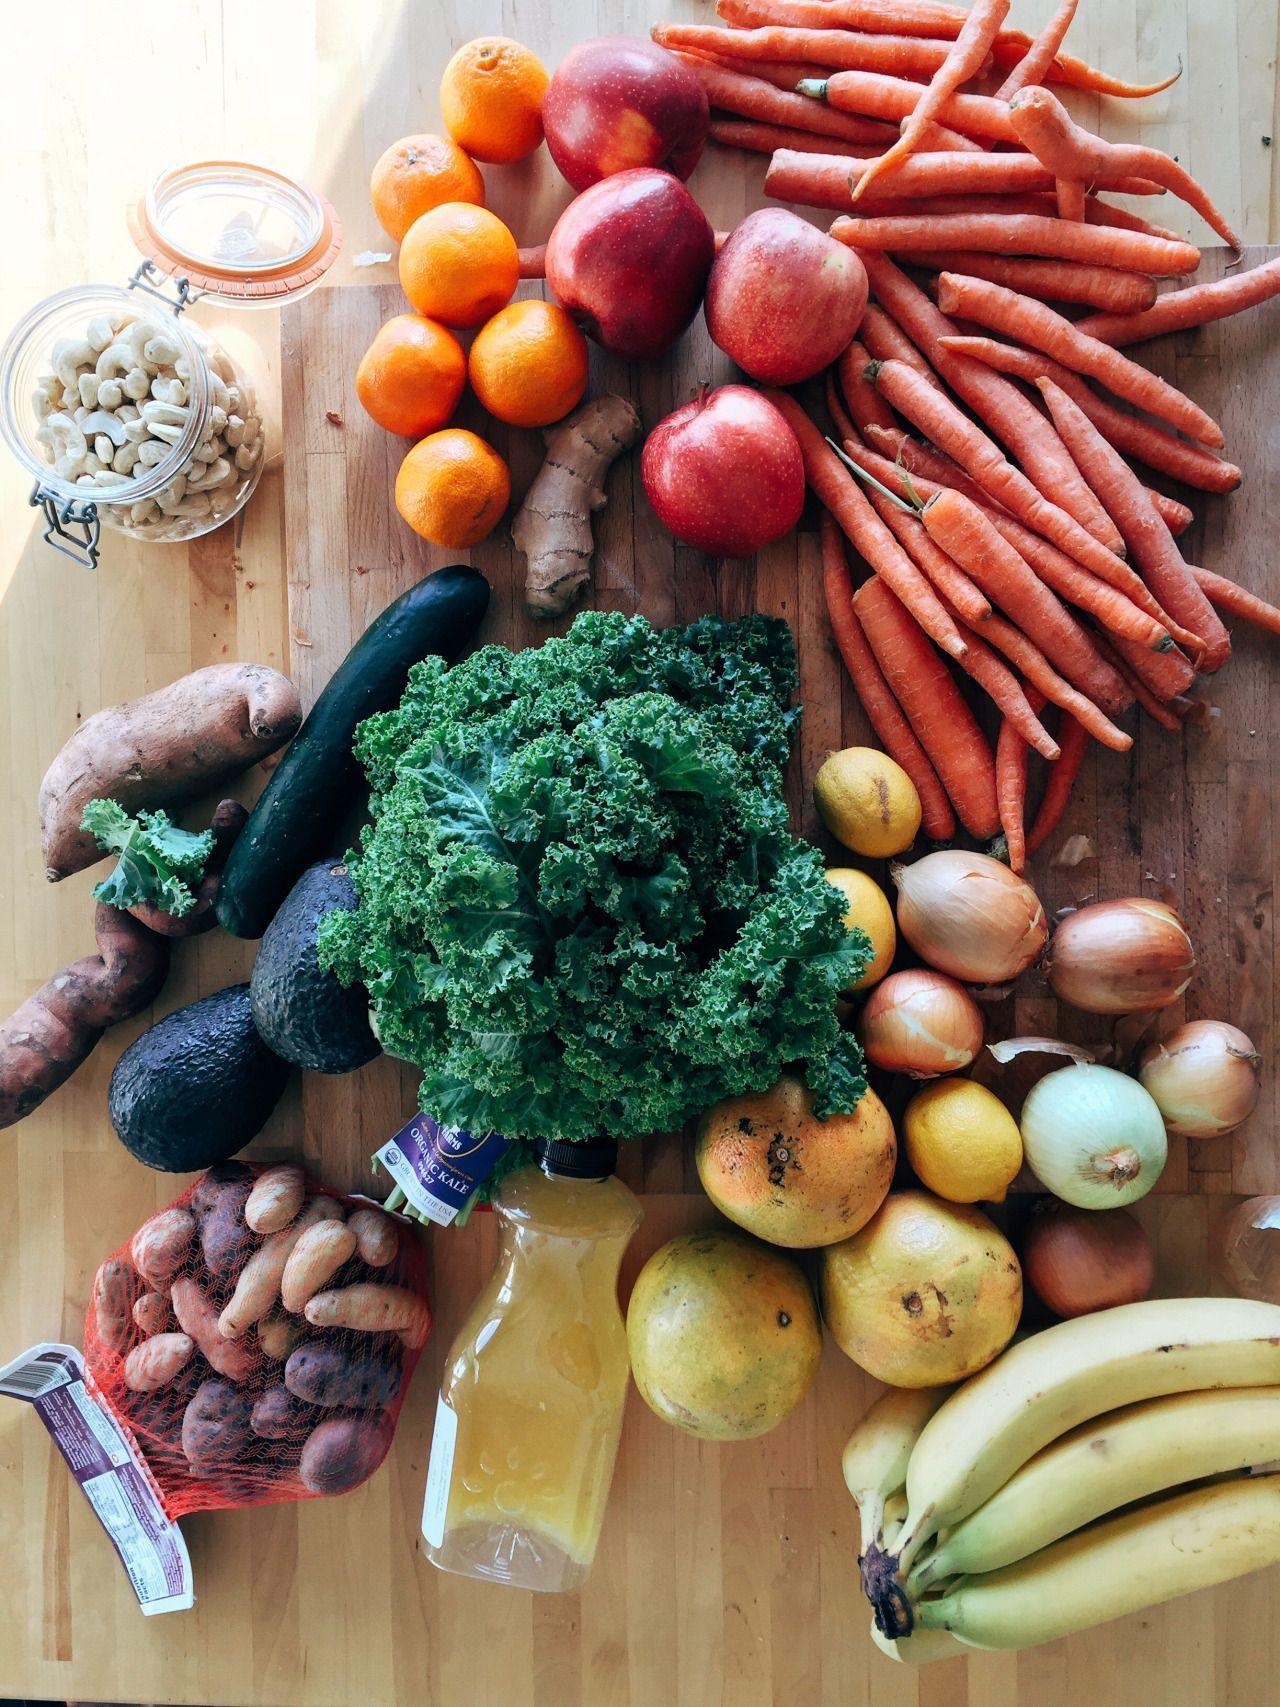 grocery haul: carrot, onions, lemons, bananas, grapefruits, orange juice, potatoes, avocados, cucumb...